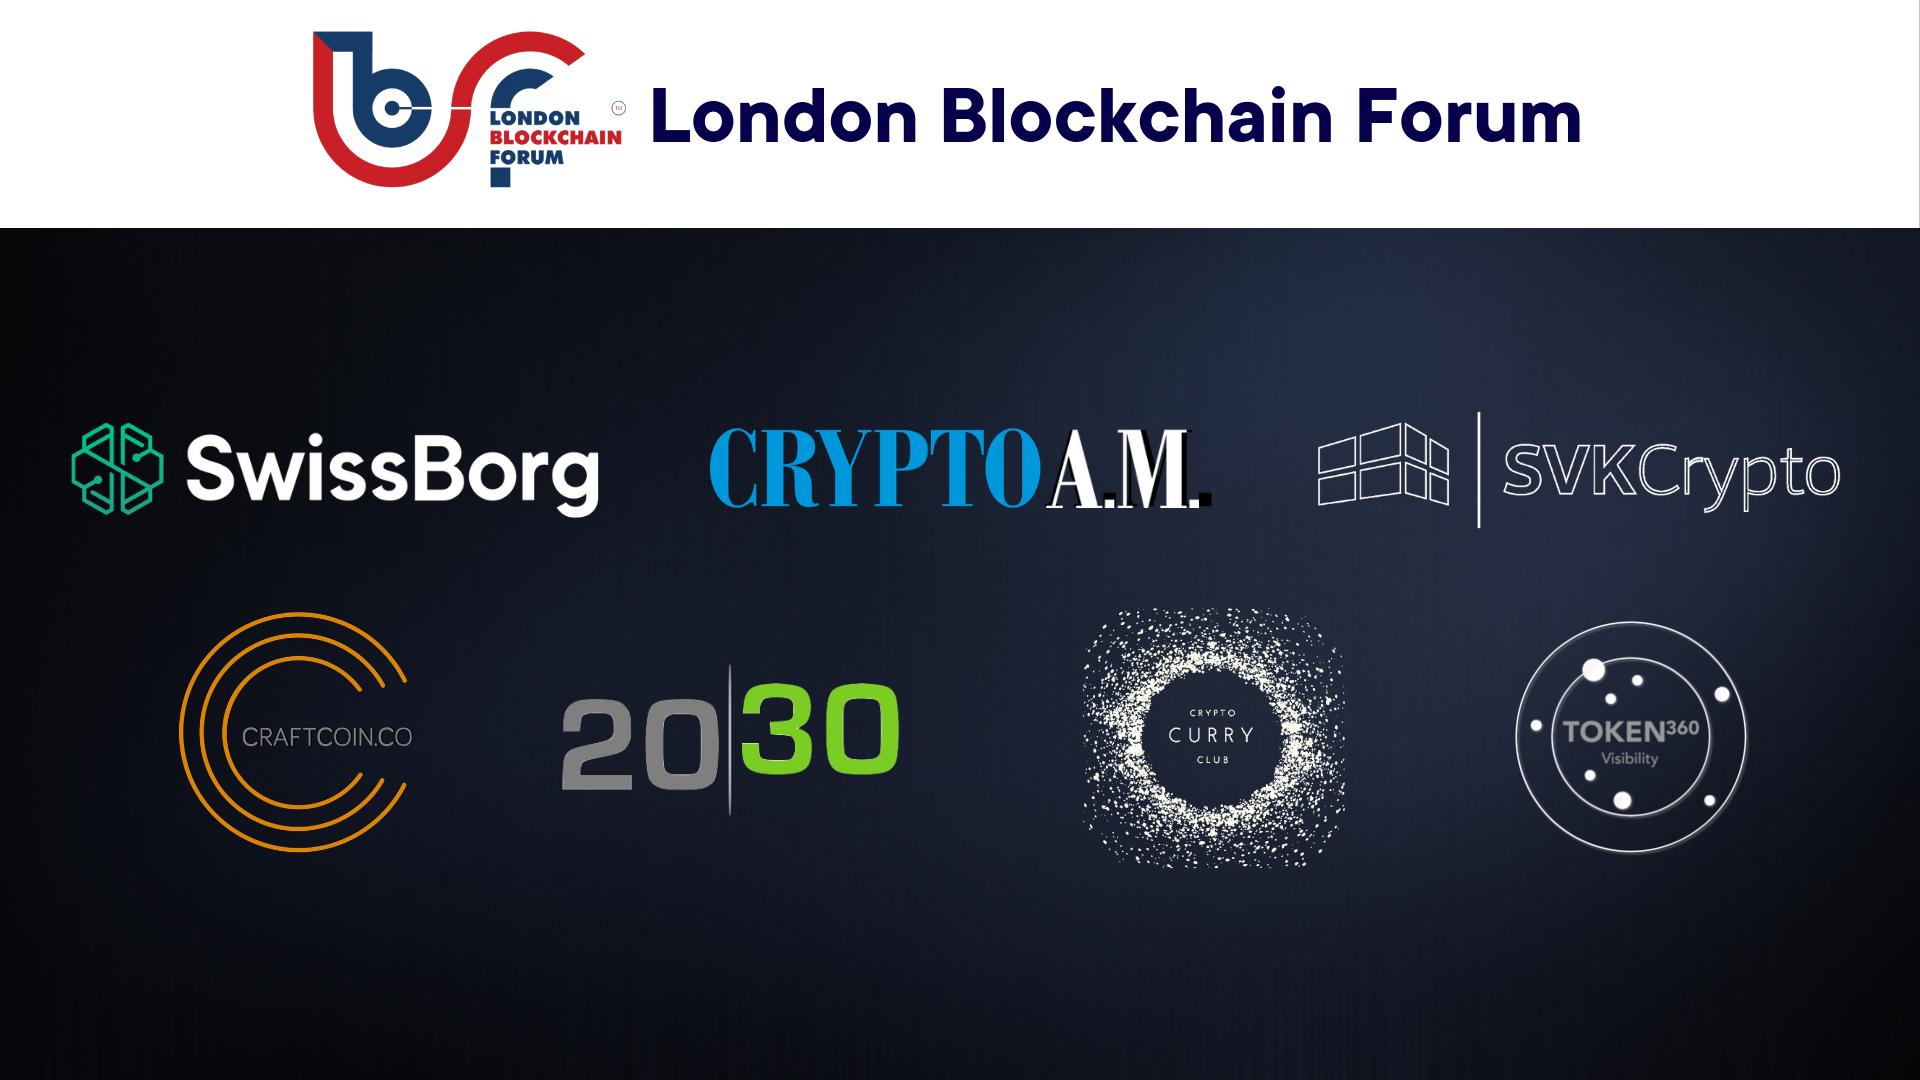 London Blockchain Forum